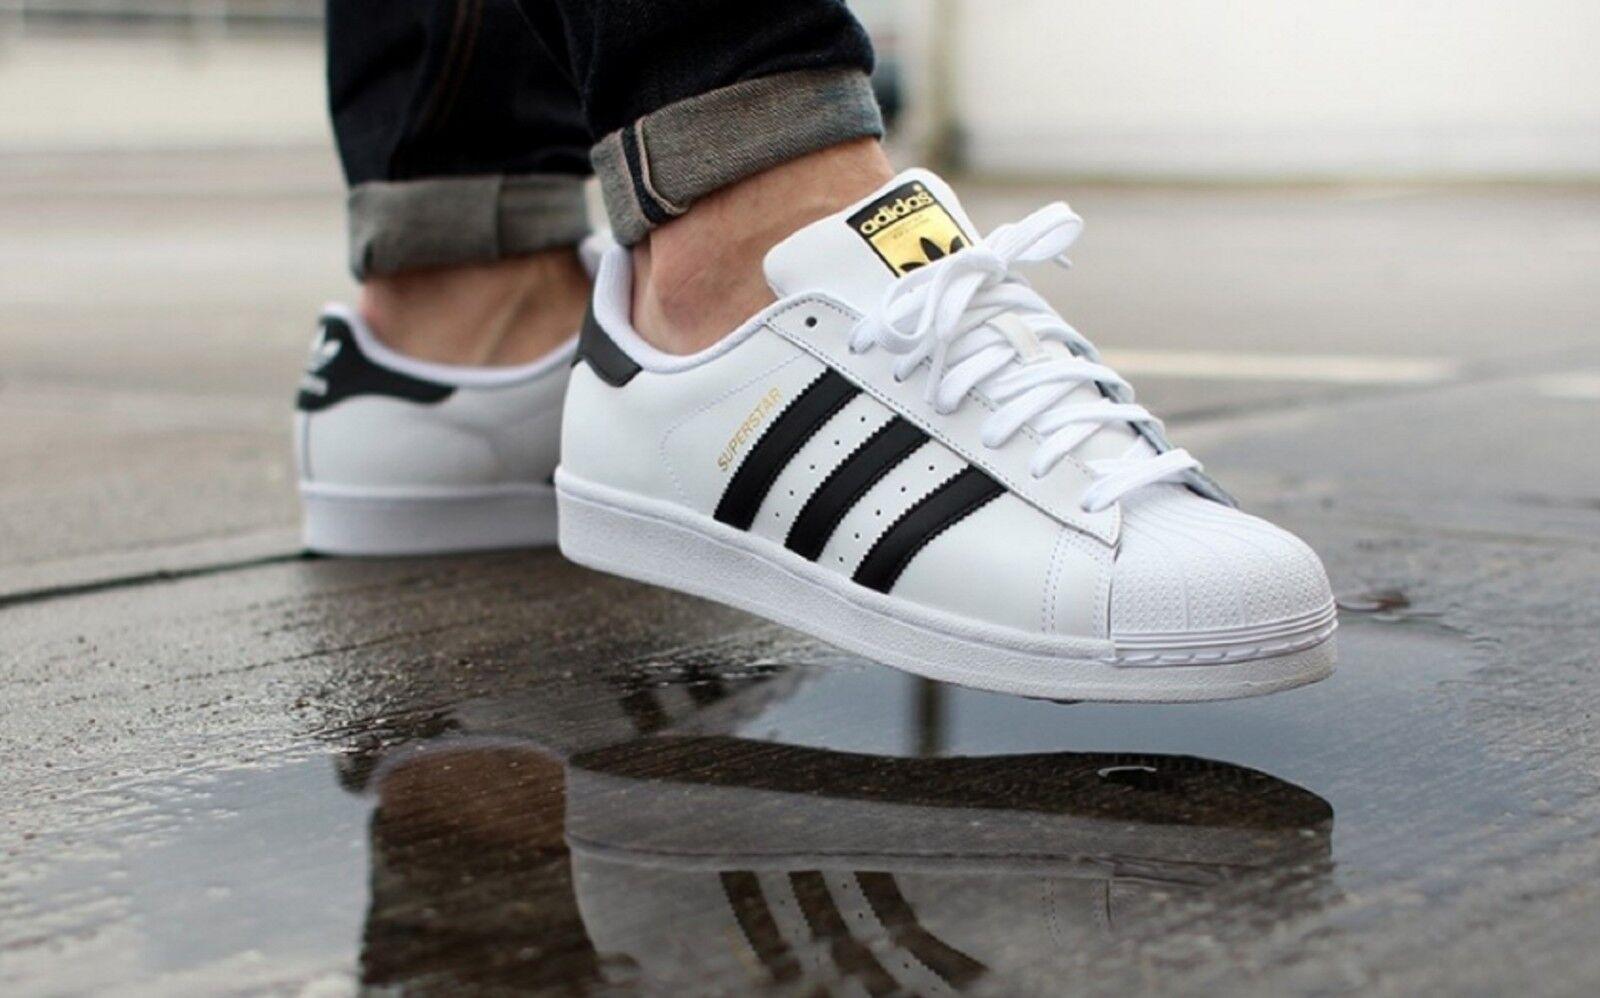 「Adidas Originals Superstar sneakers」的圖片搜尋結果